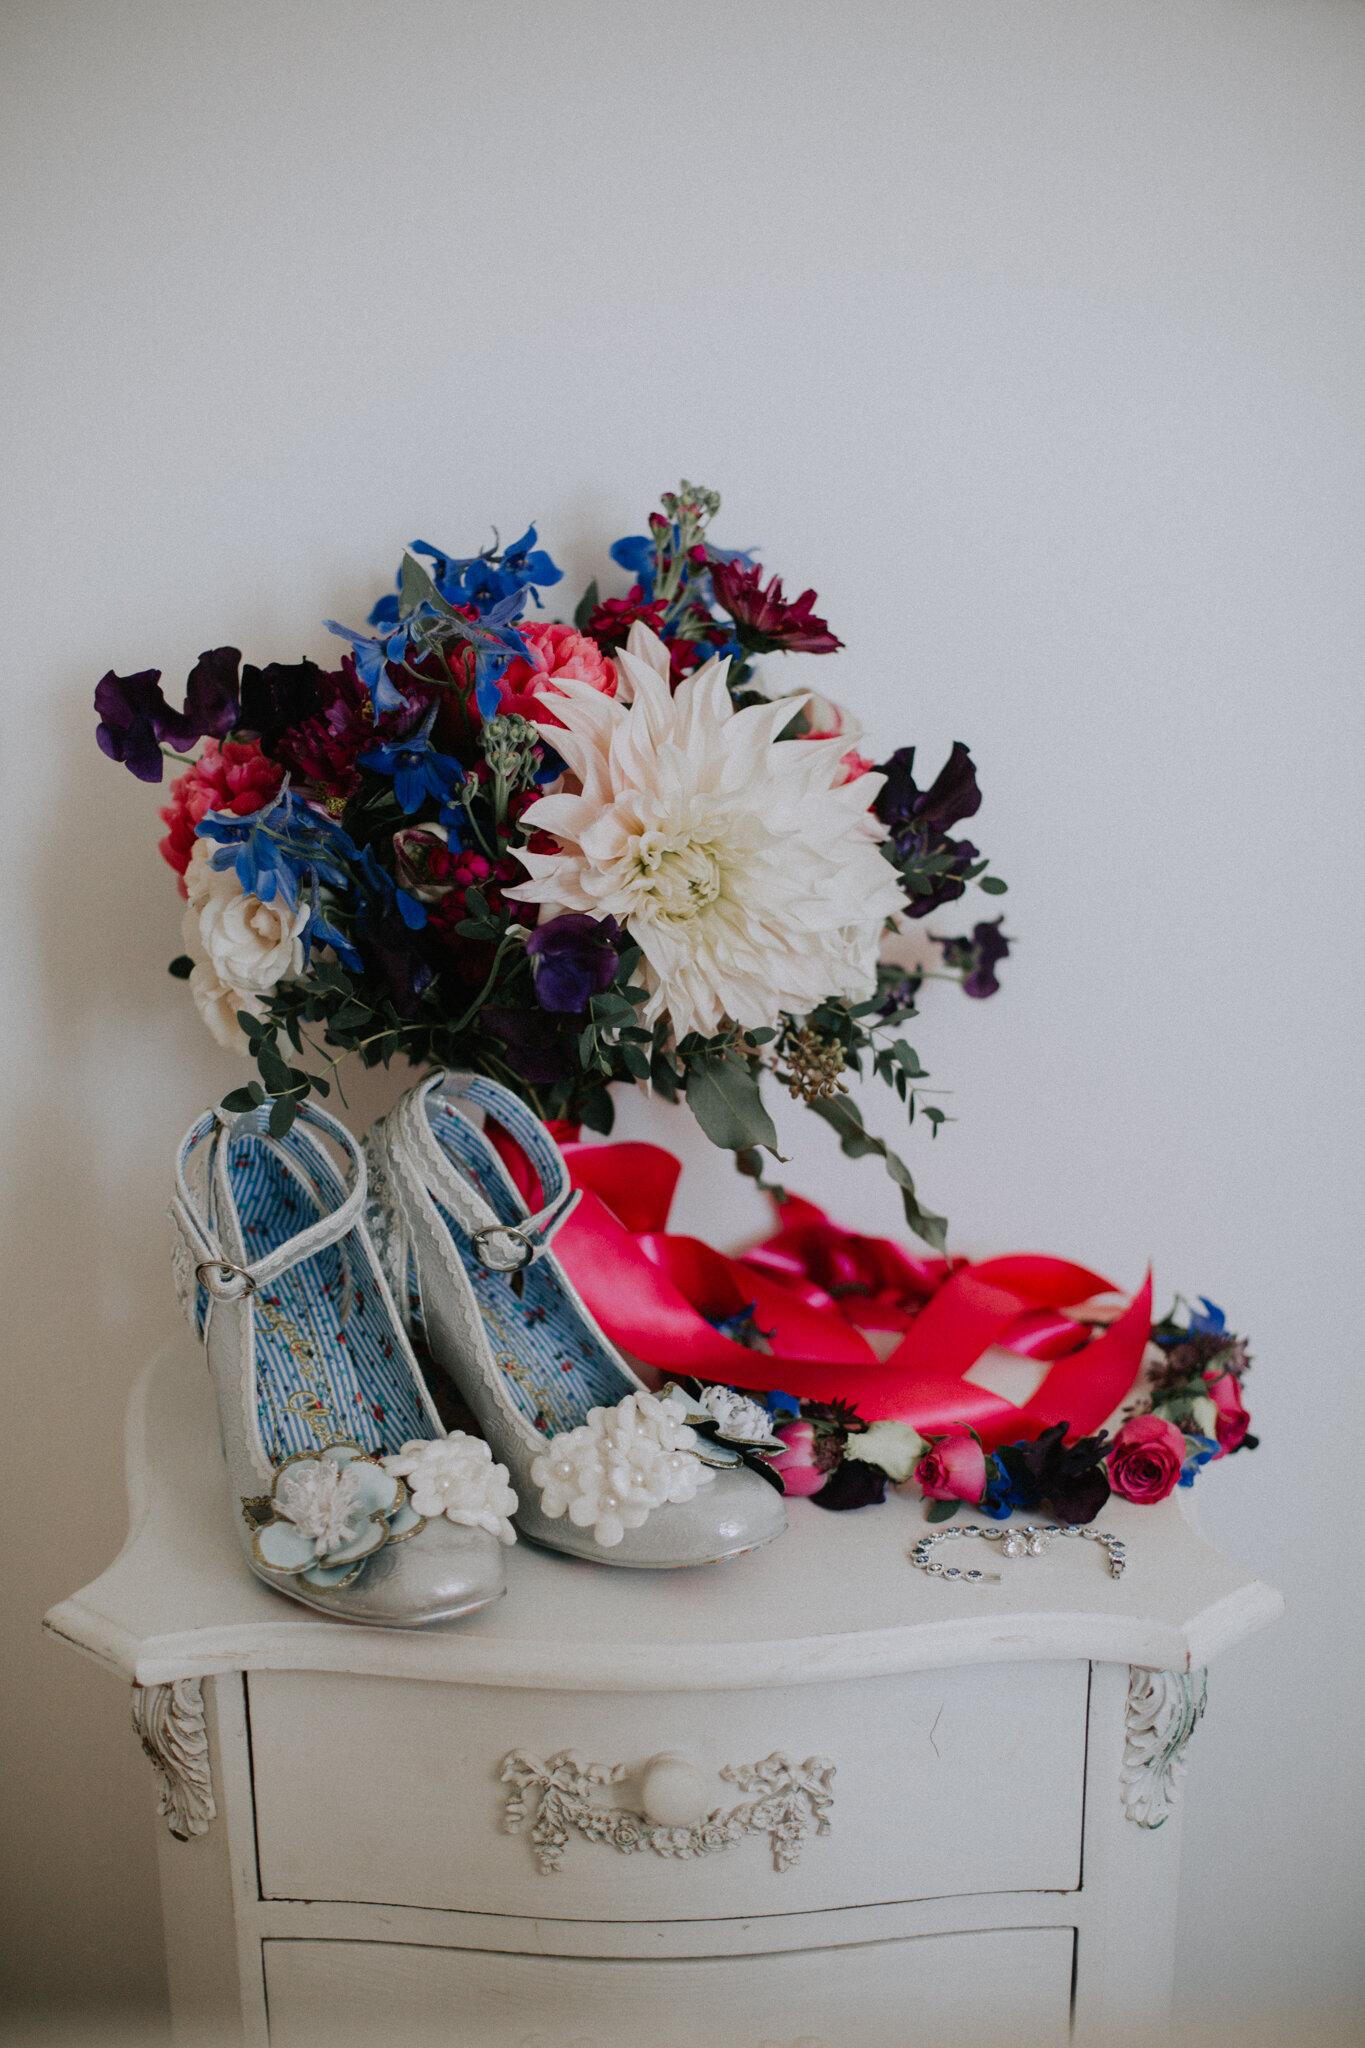 Bride's shoes and wedding bouquet shot